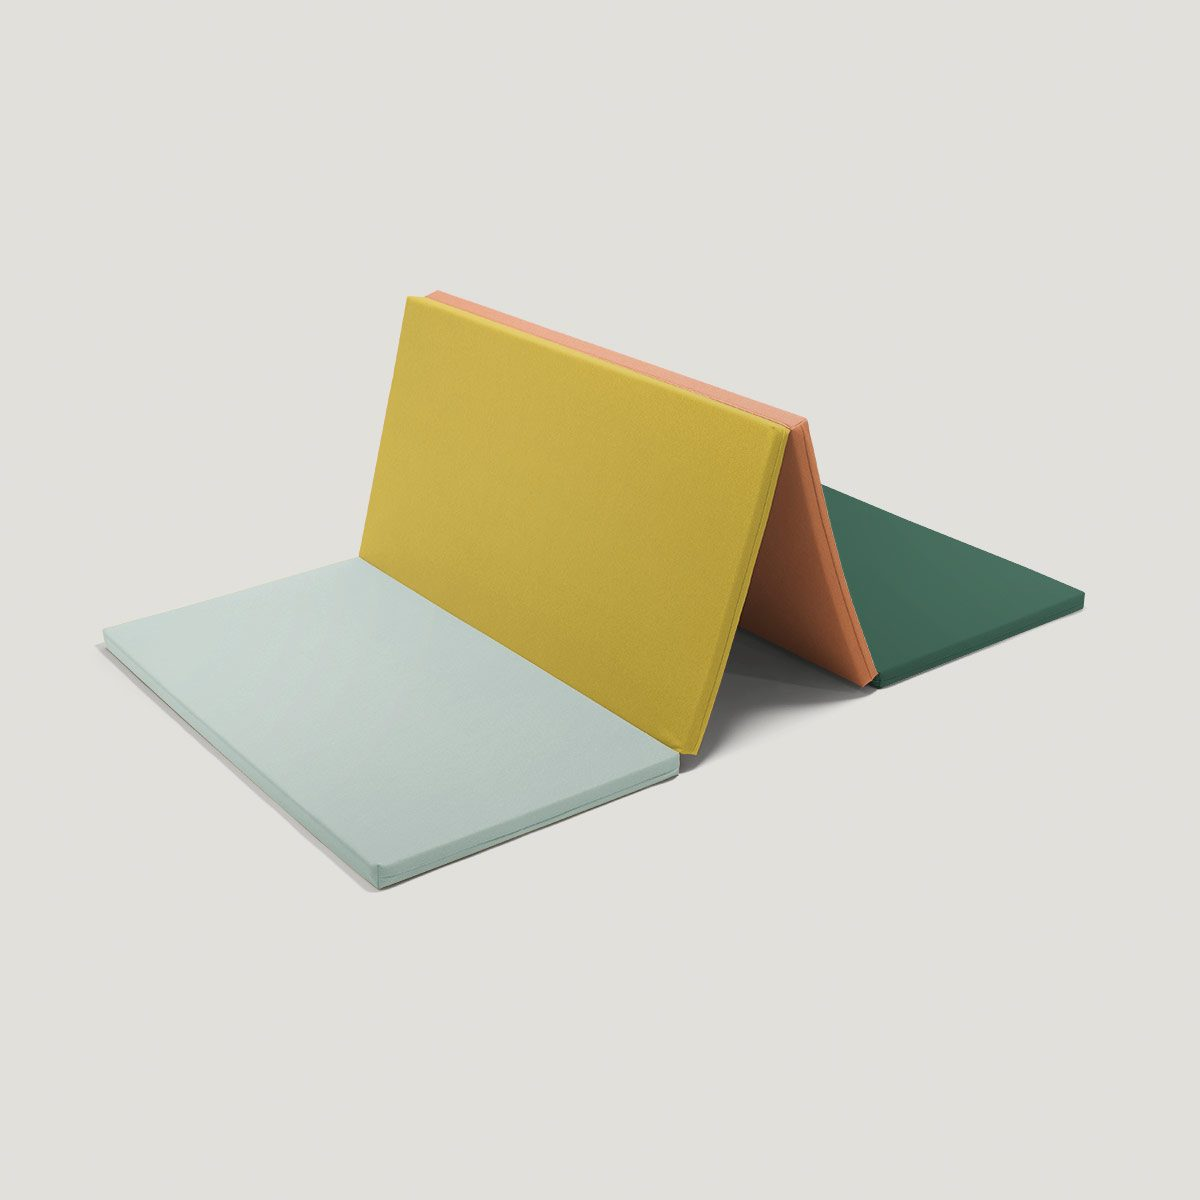 LEVEL_folding_play_mat_earthy_folded3